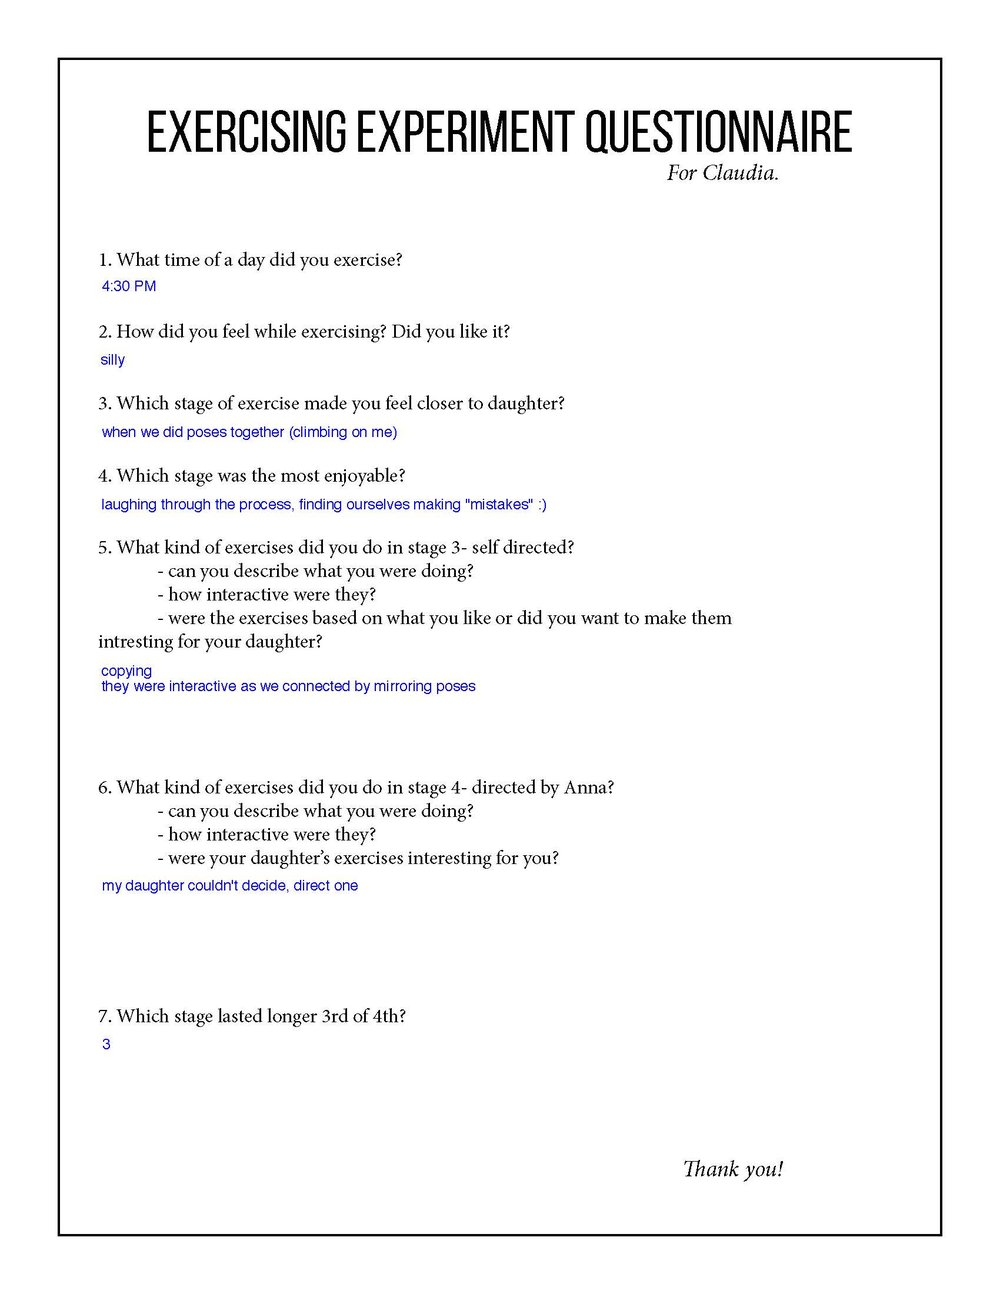 Questionnaire Claudia & Anna_Page_1.jpg